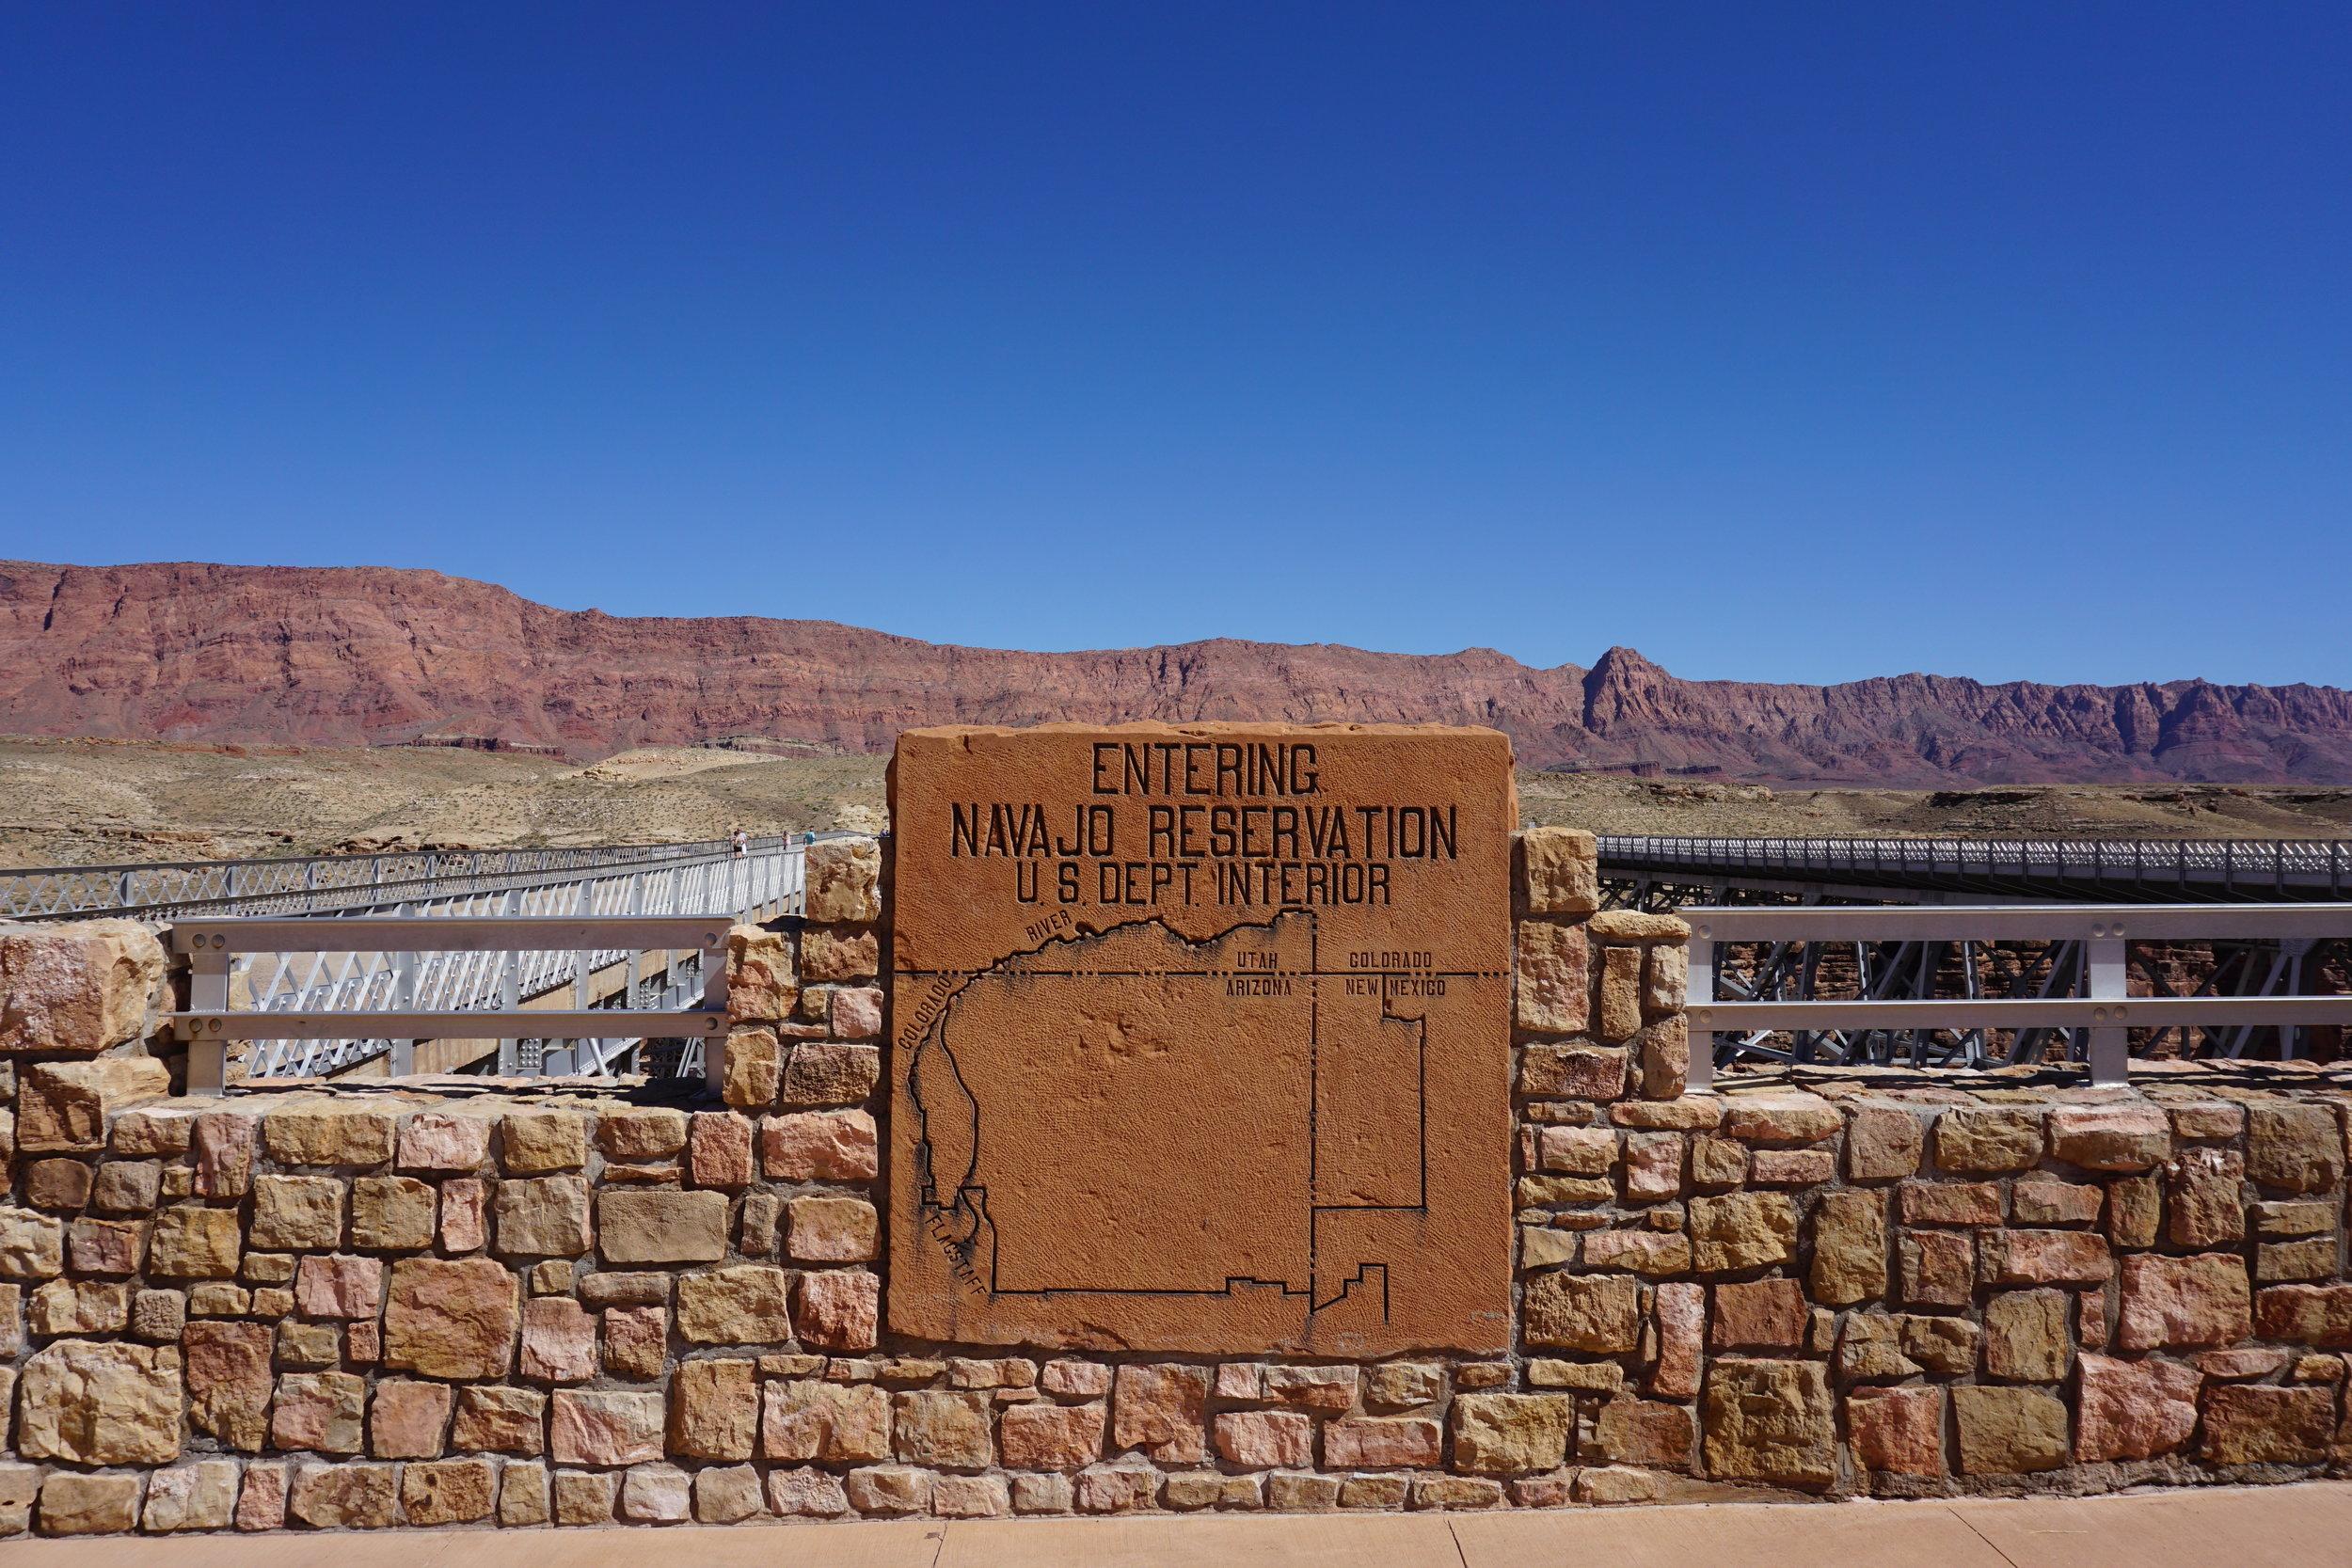 Colorado River boundary of Navajo Reservation